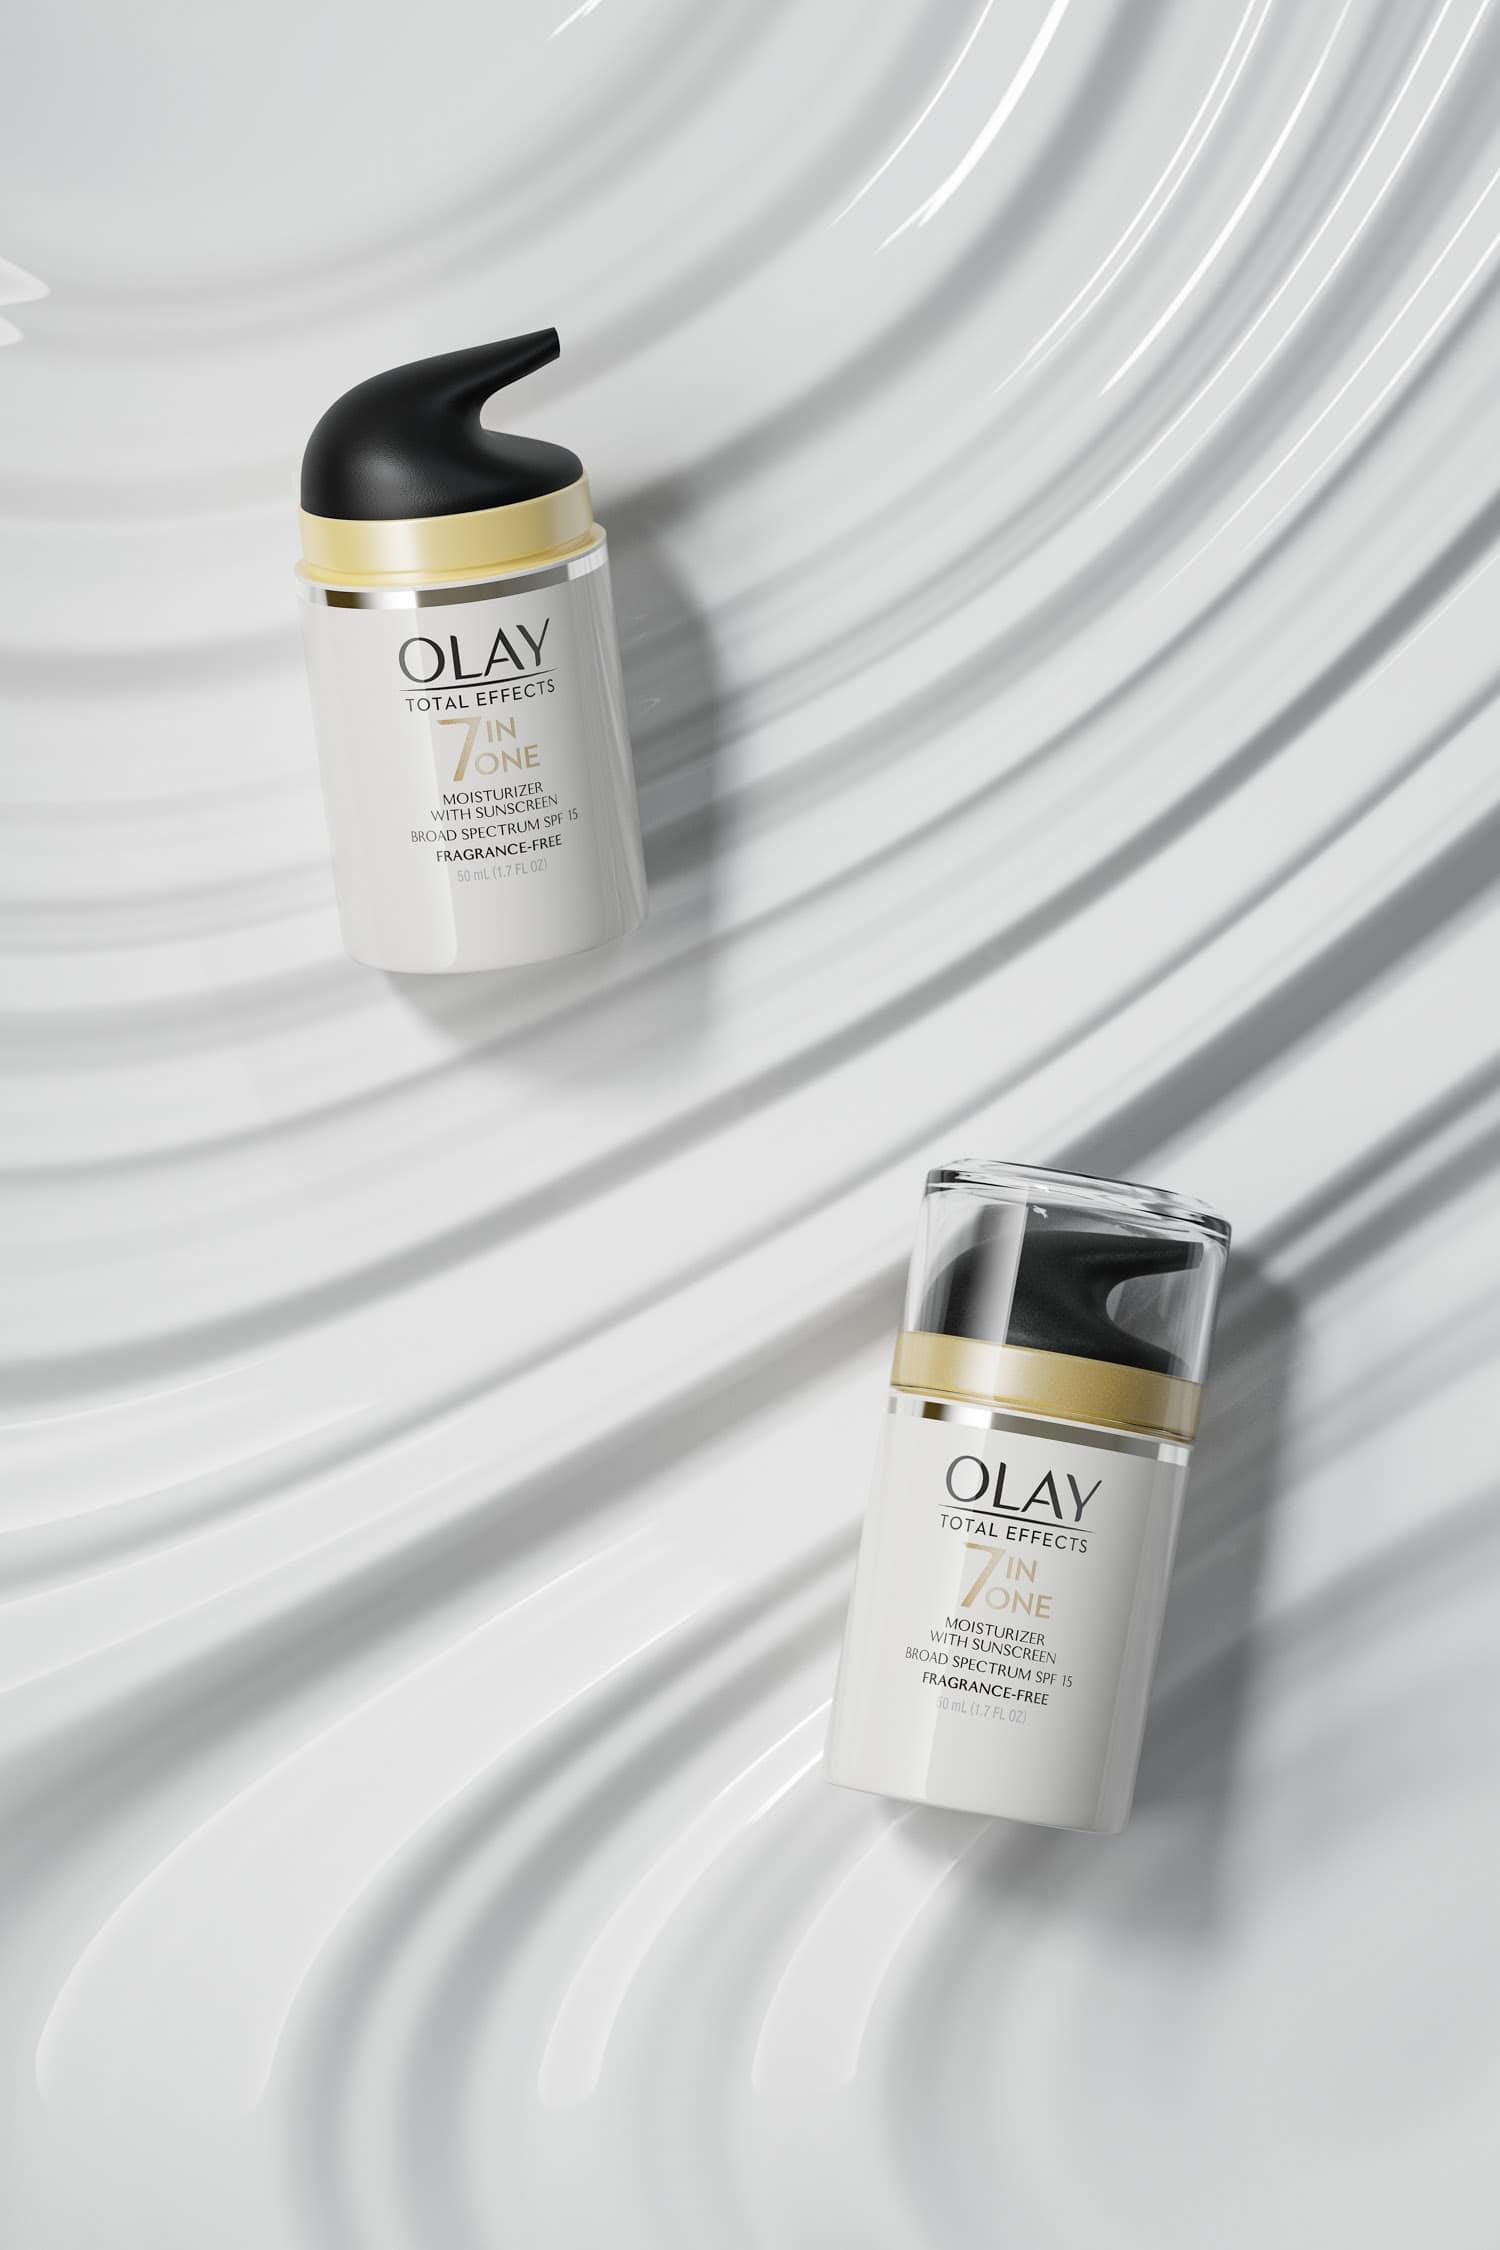 CGI Cosmetics Photography